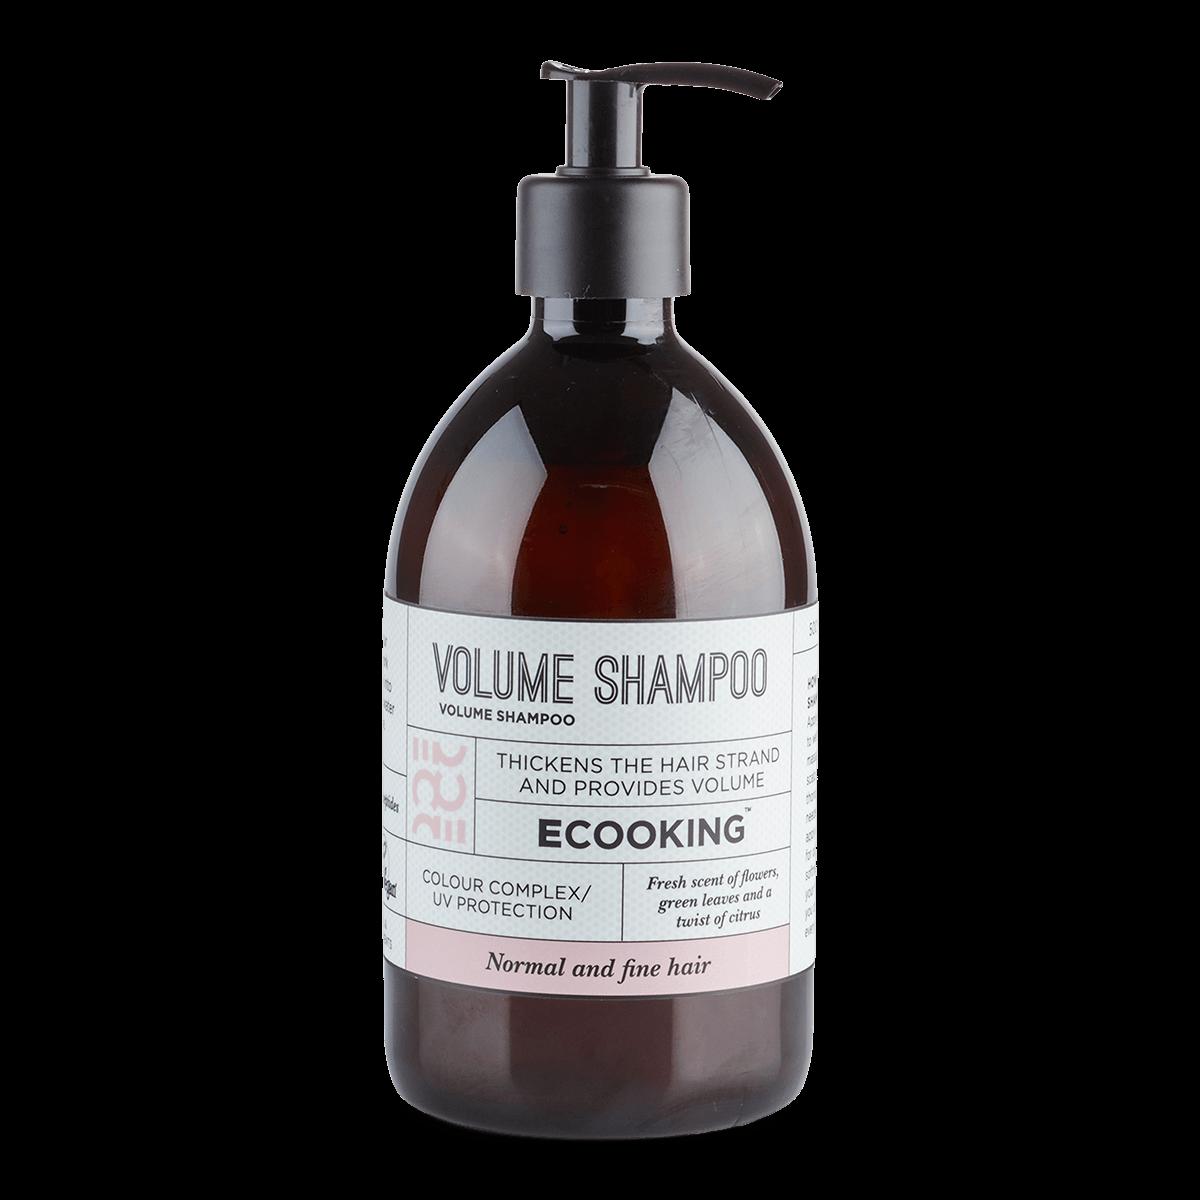 volume-shampoo-ecooking-500ml